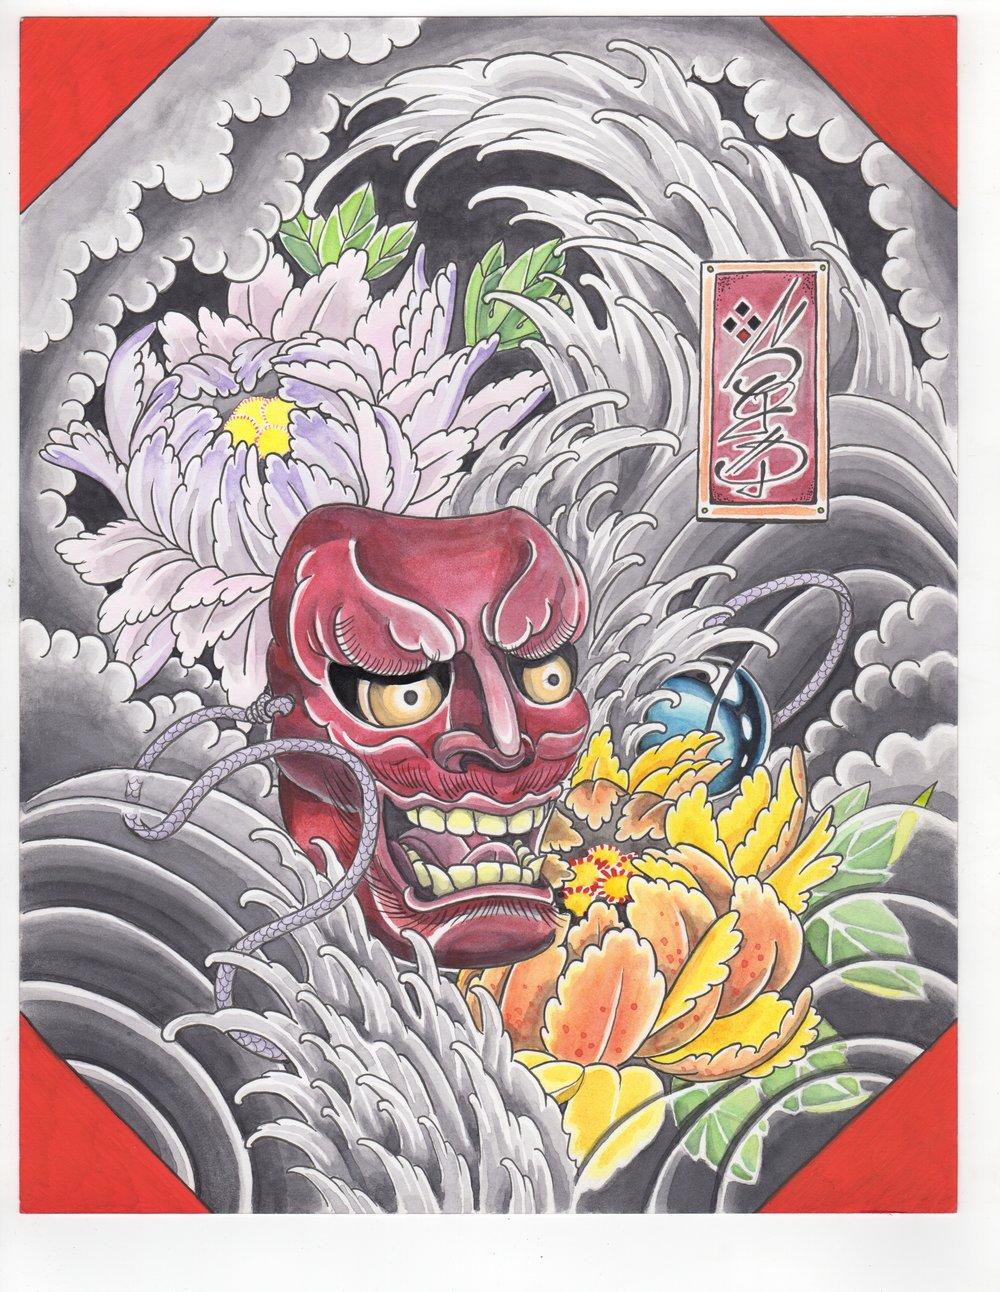 Ryujin Mask